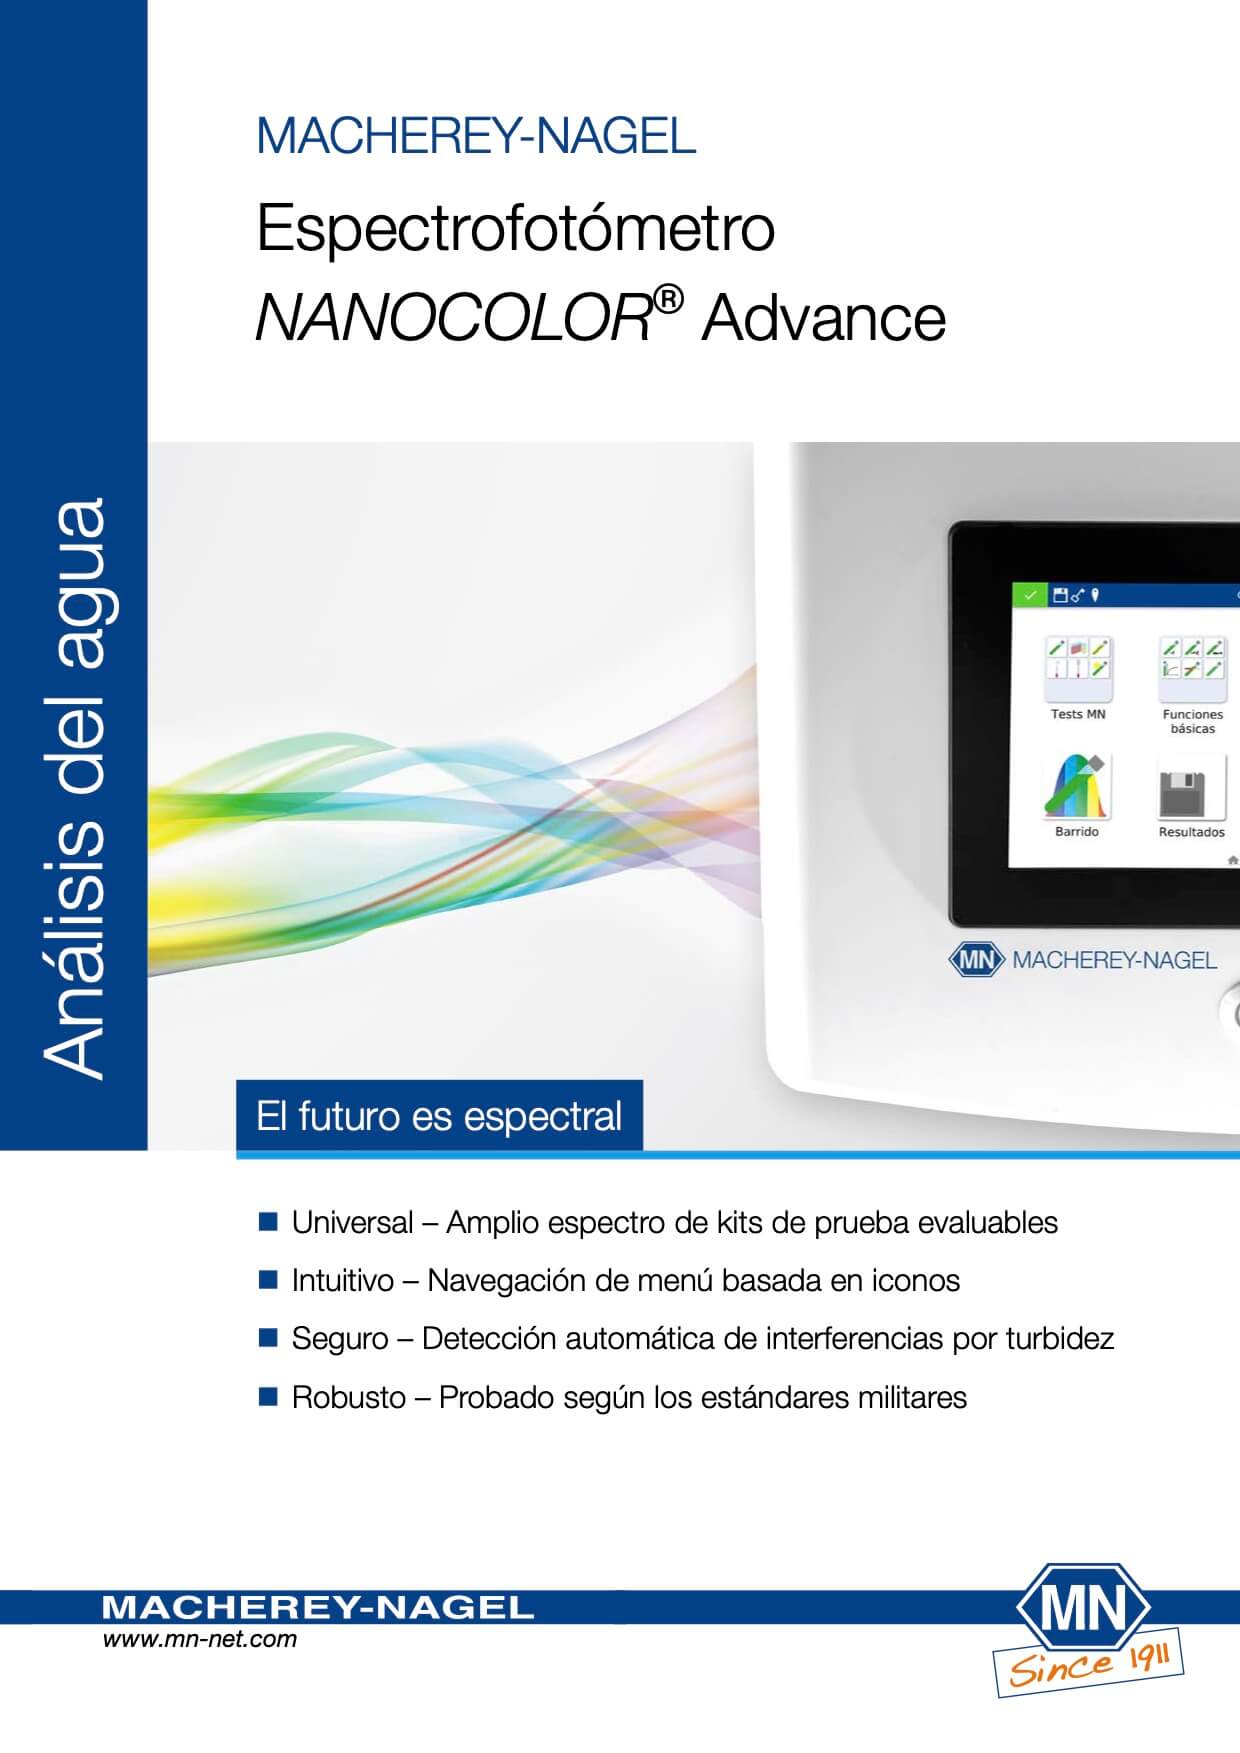 Espectrofotómetro NANOCOLOR® Advance